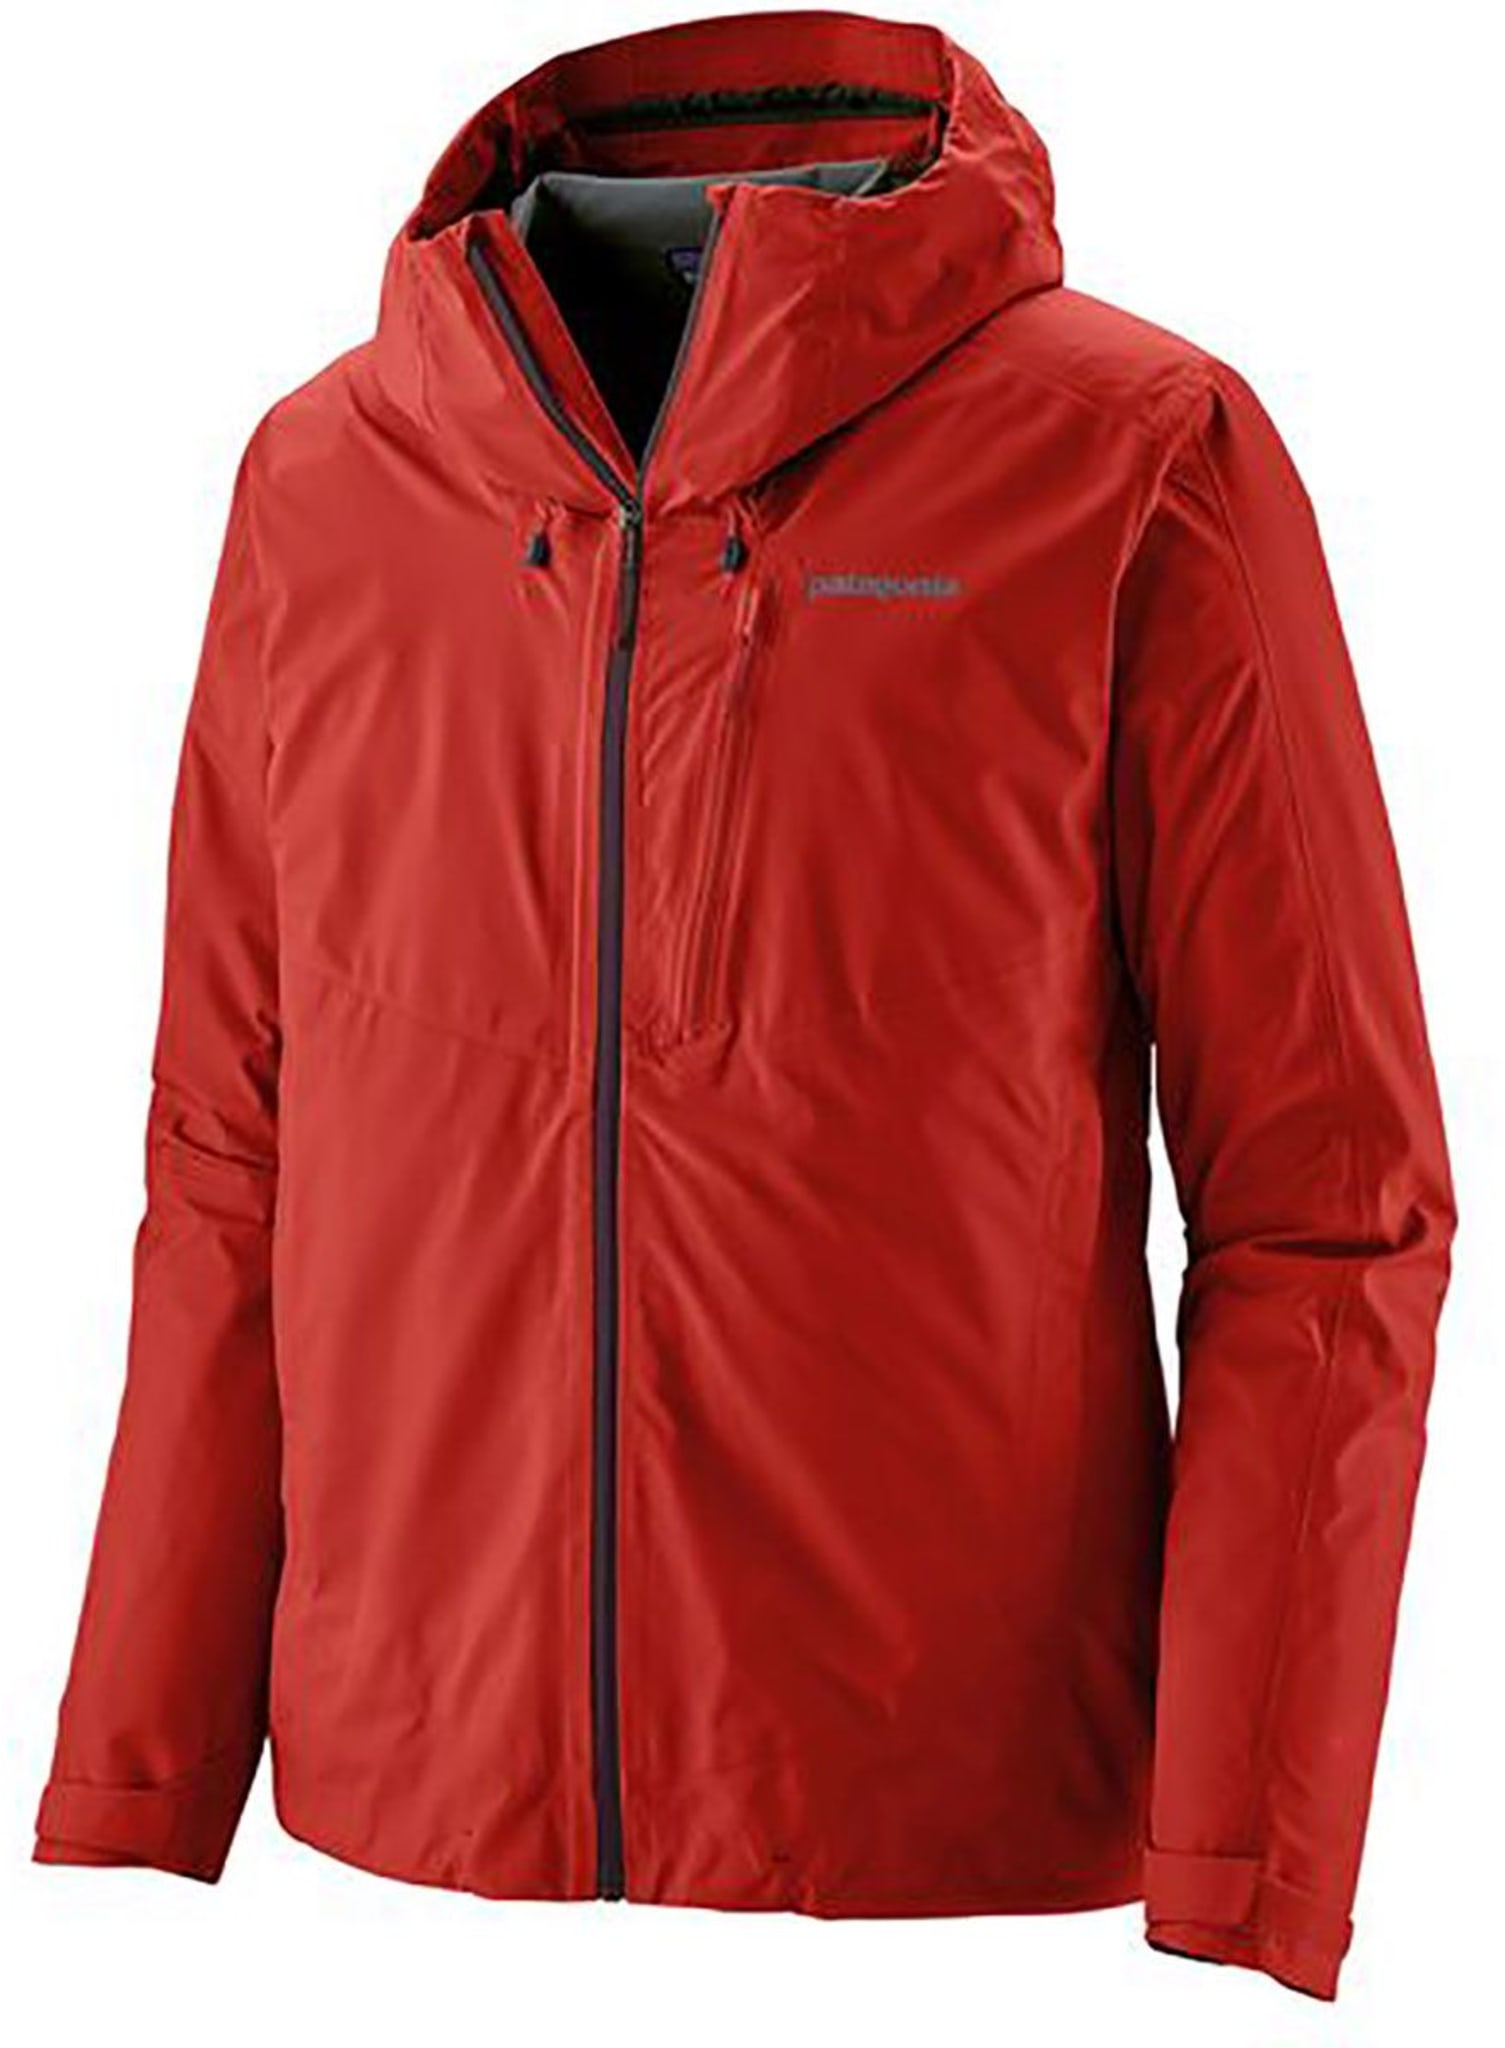 Calcite Jacket Ms